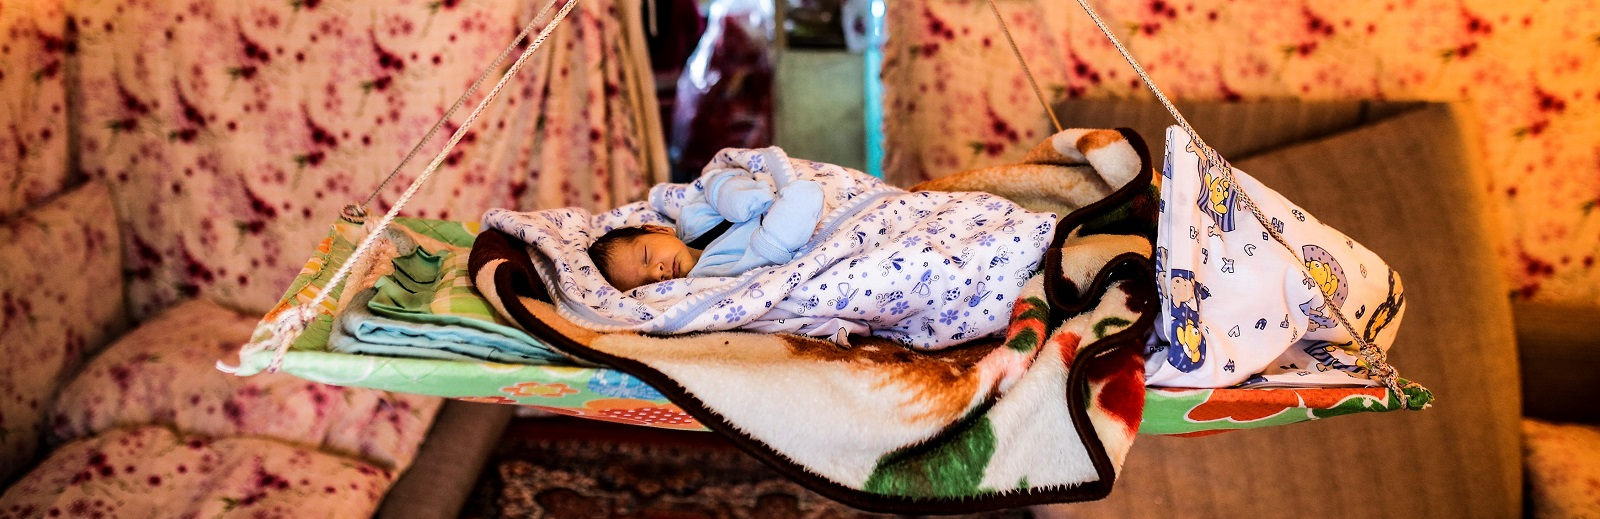 Syrian refugee camp in Turkey (Photo courtesy of European Parliament)